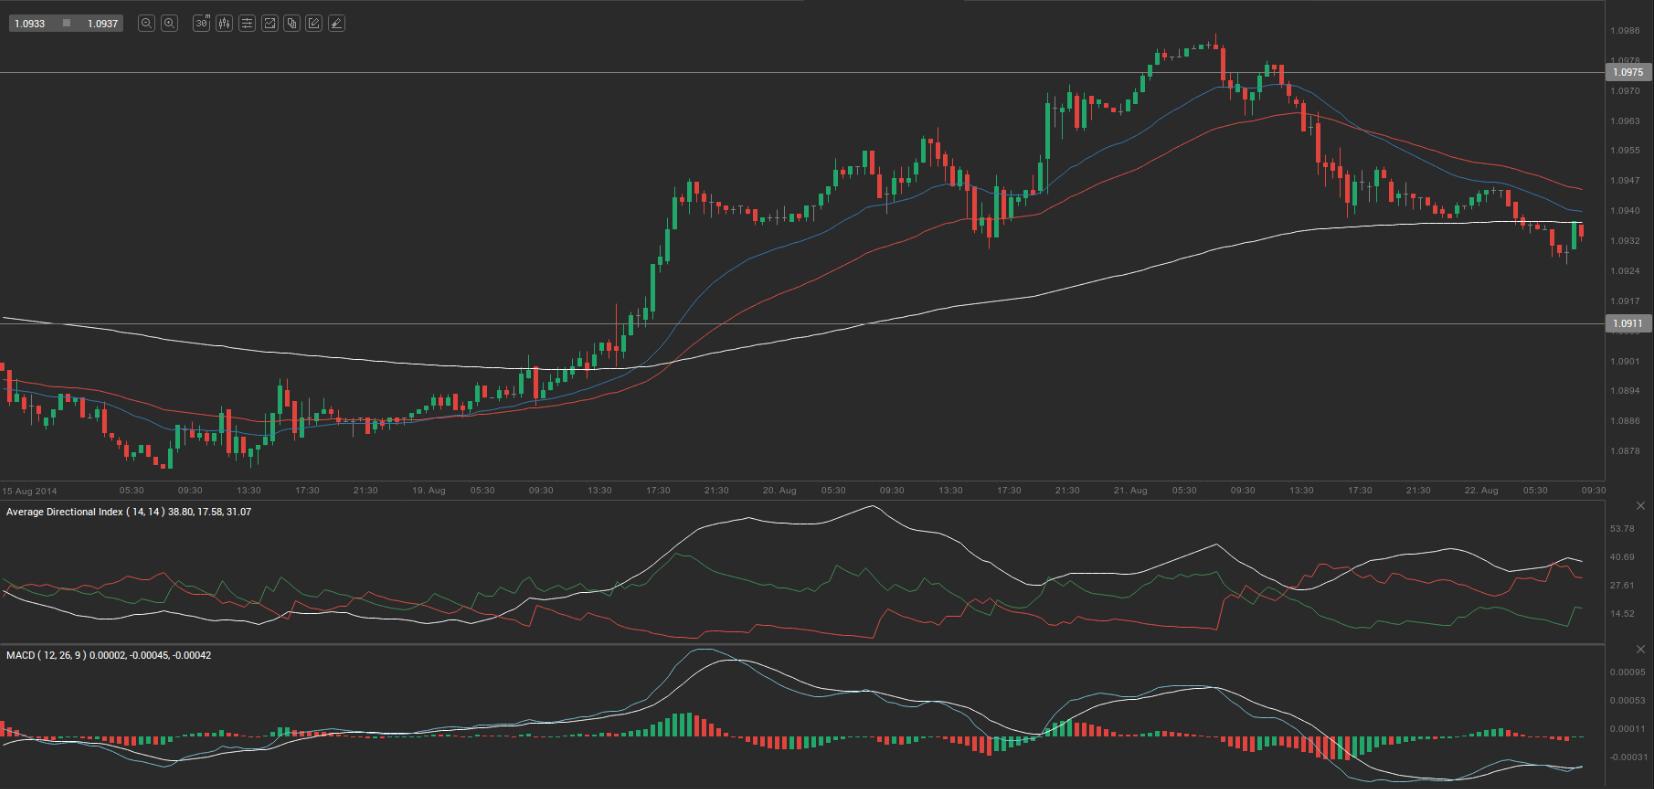 USD/CAD: US Dollar - Canadian Dollar Rate, Chart & Analysis